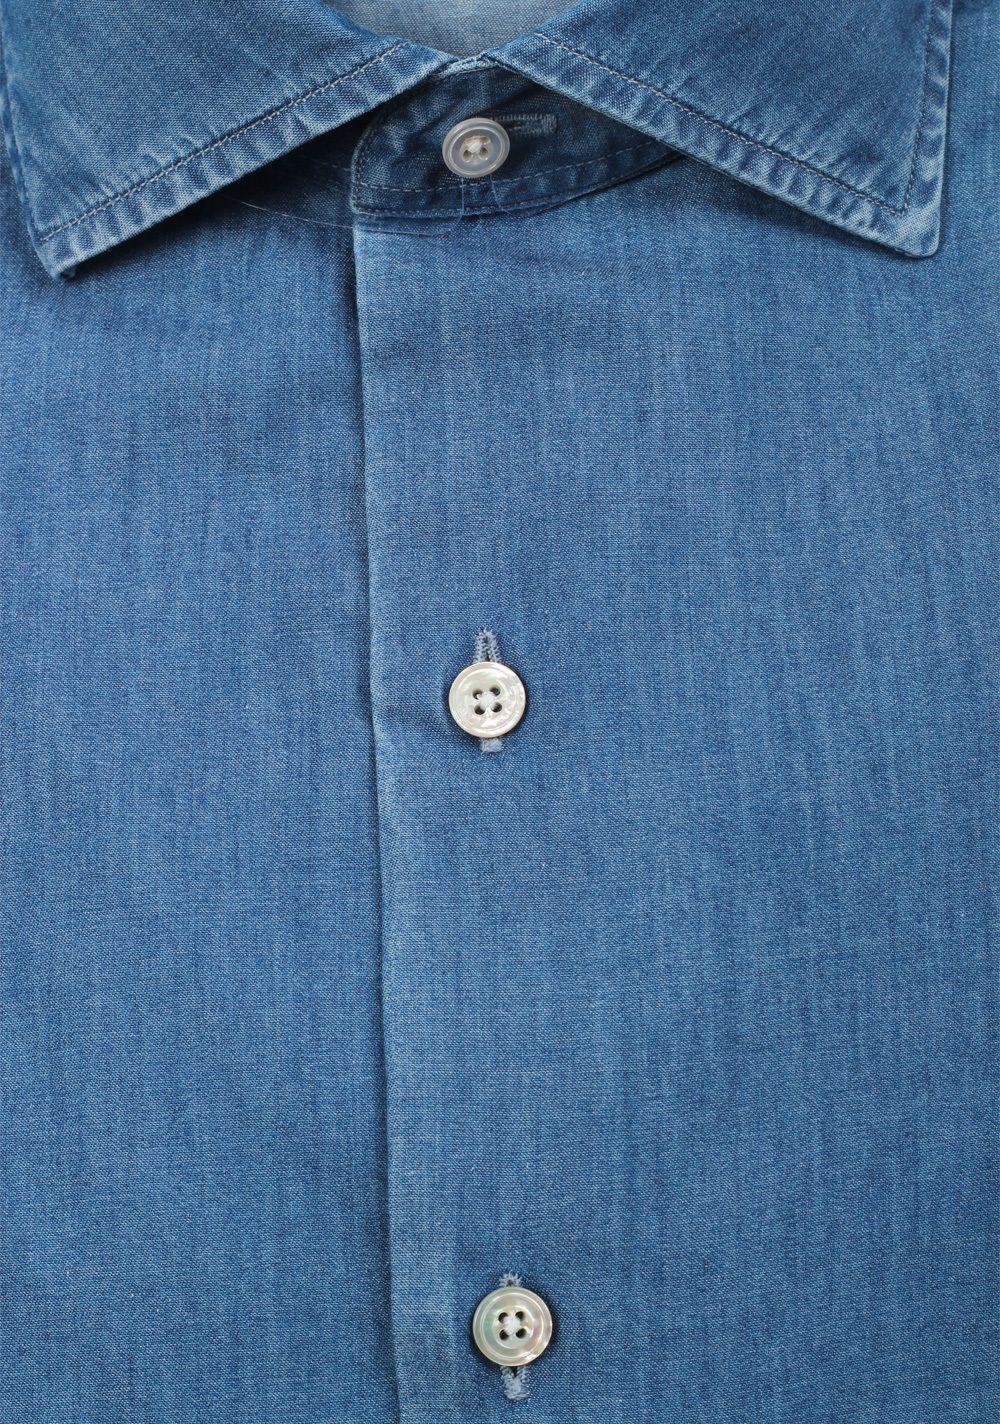 TOM FORD Solid Blue Denim Dress Shirt Size 42 / 16,5 U.S.   Costume Limité